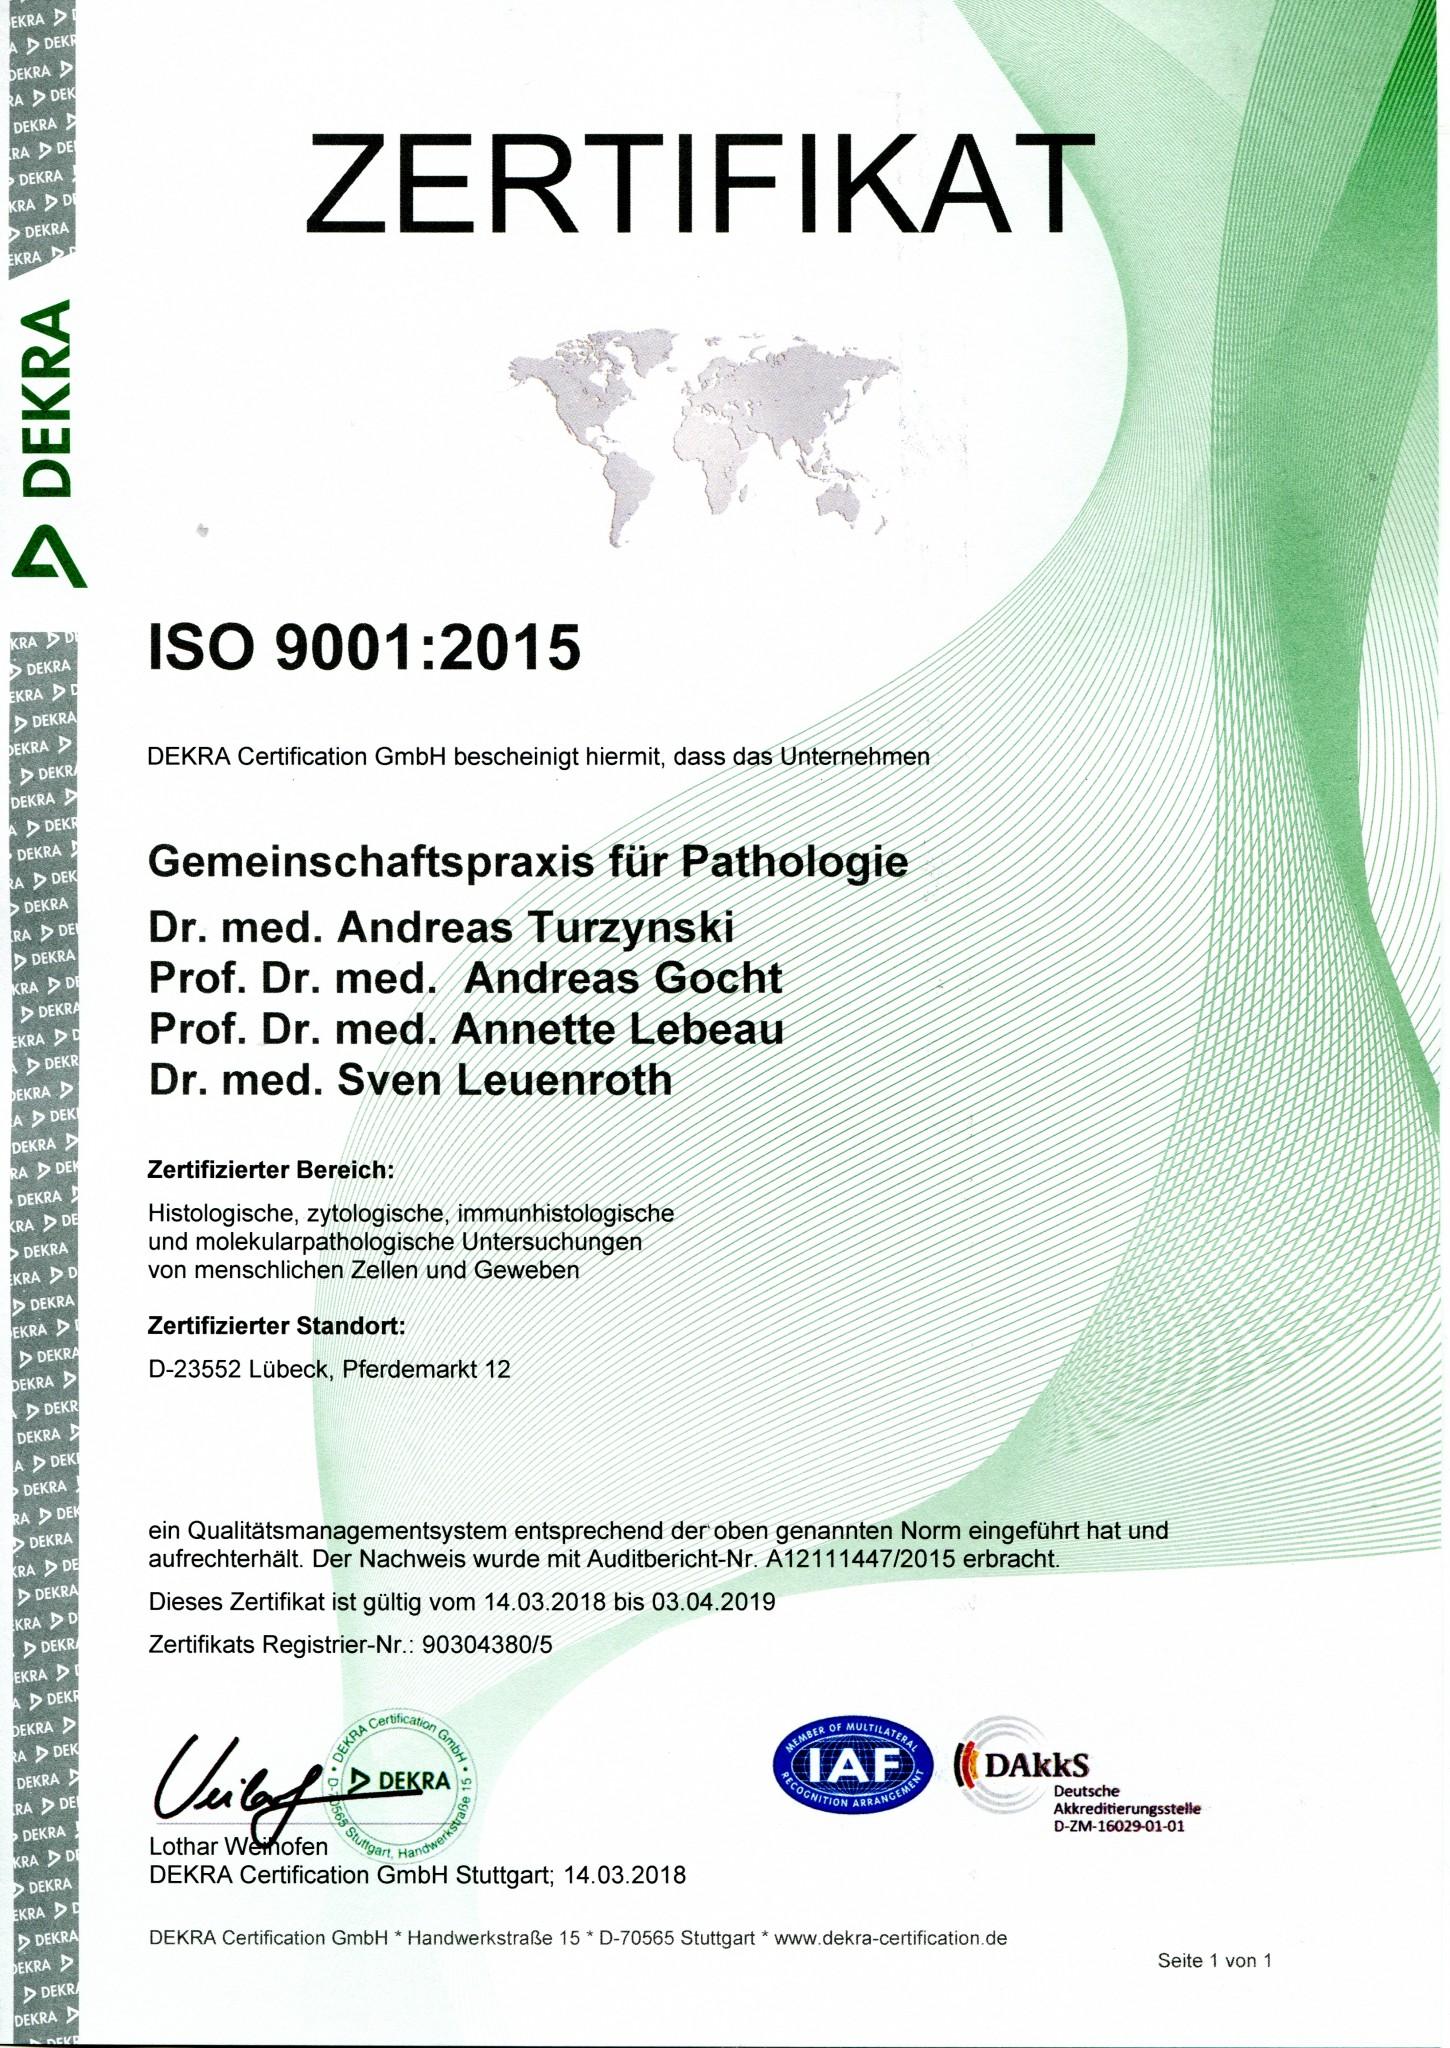 Zertifikat 2018037